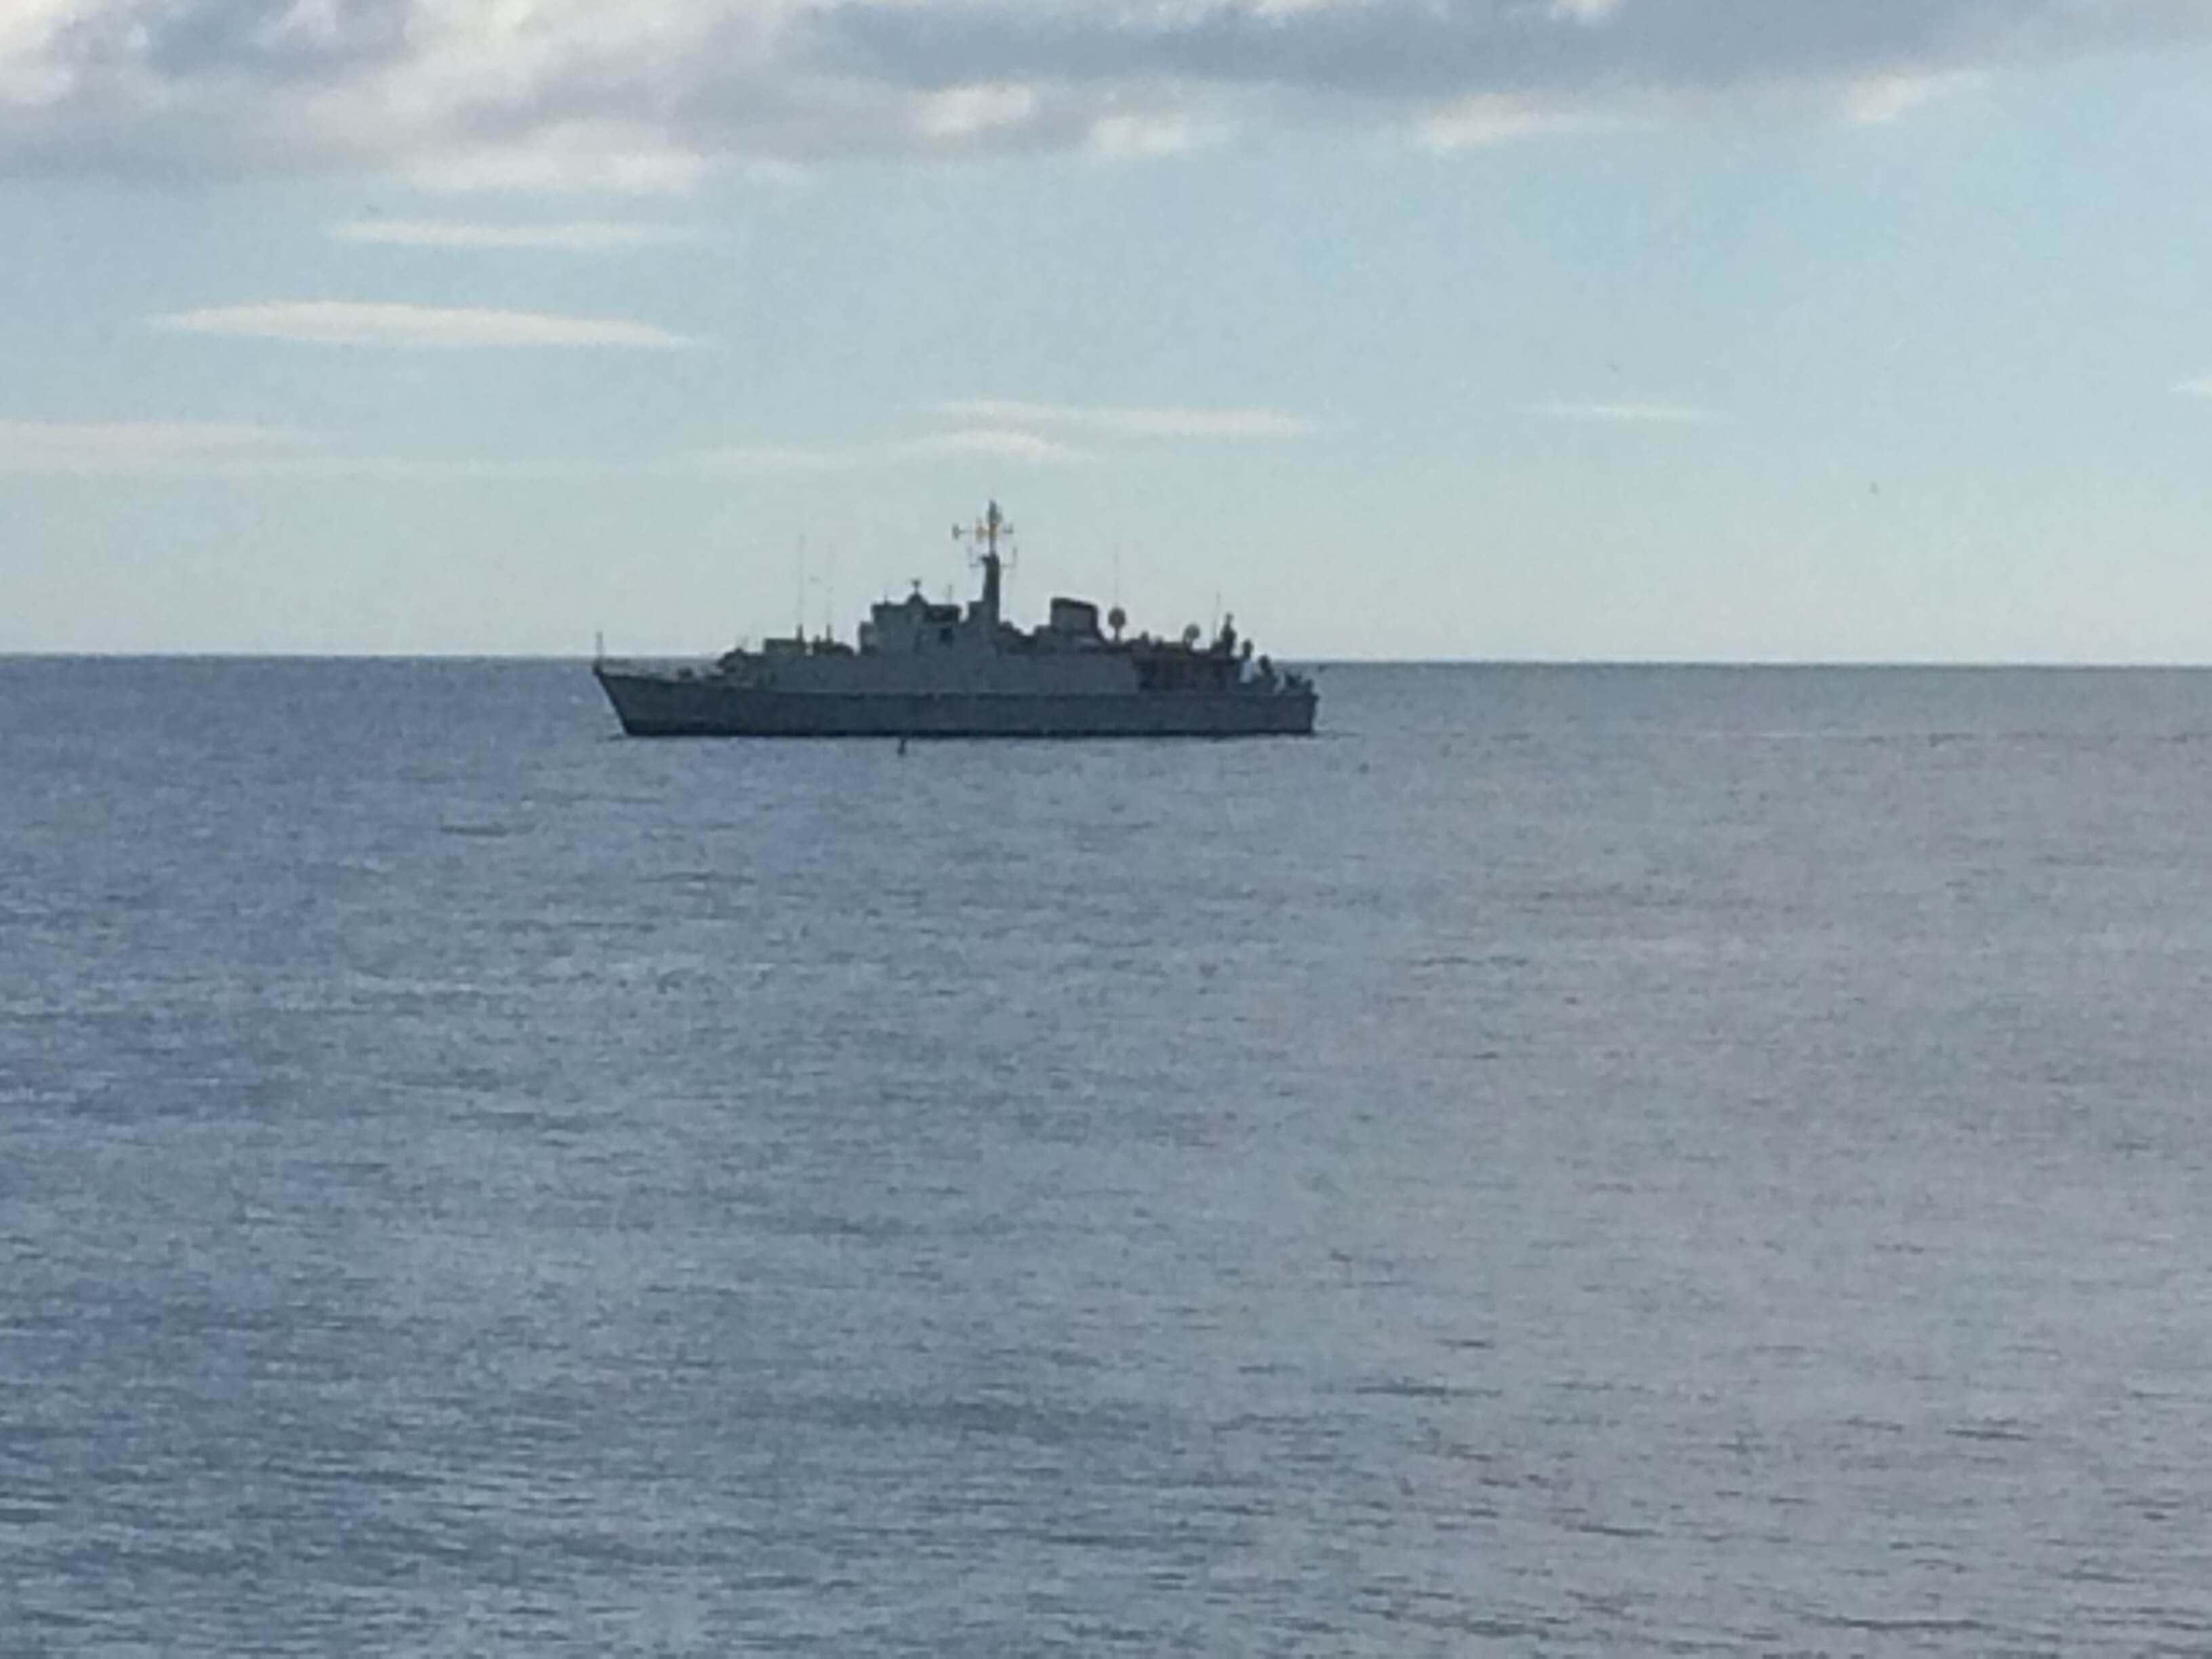 WATCH: WWI torpedo explosion off Sunderland's Roker Pier